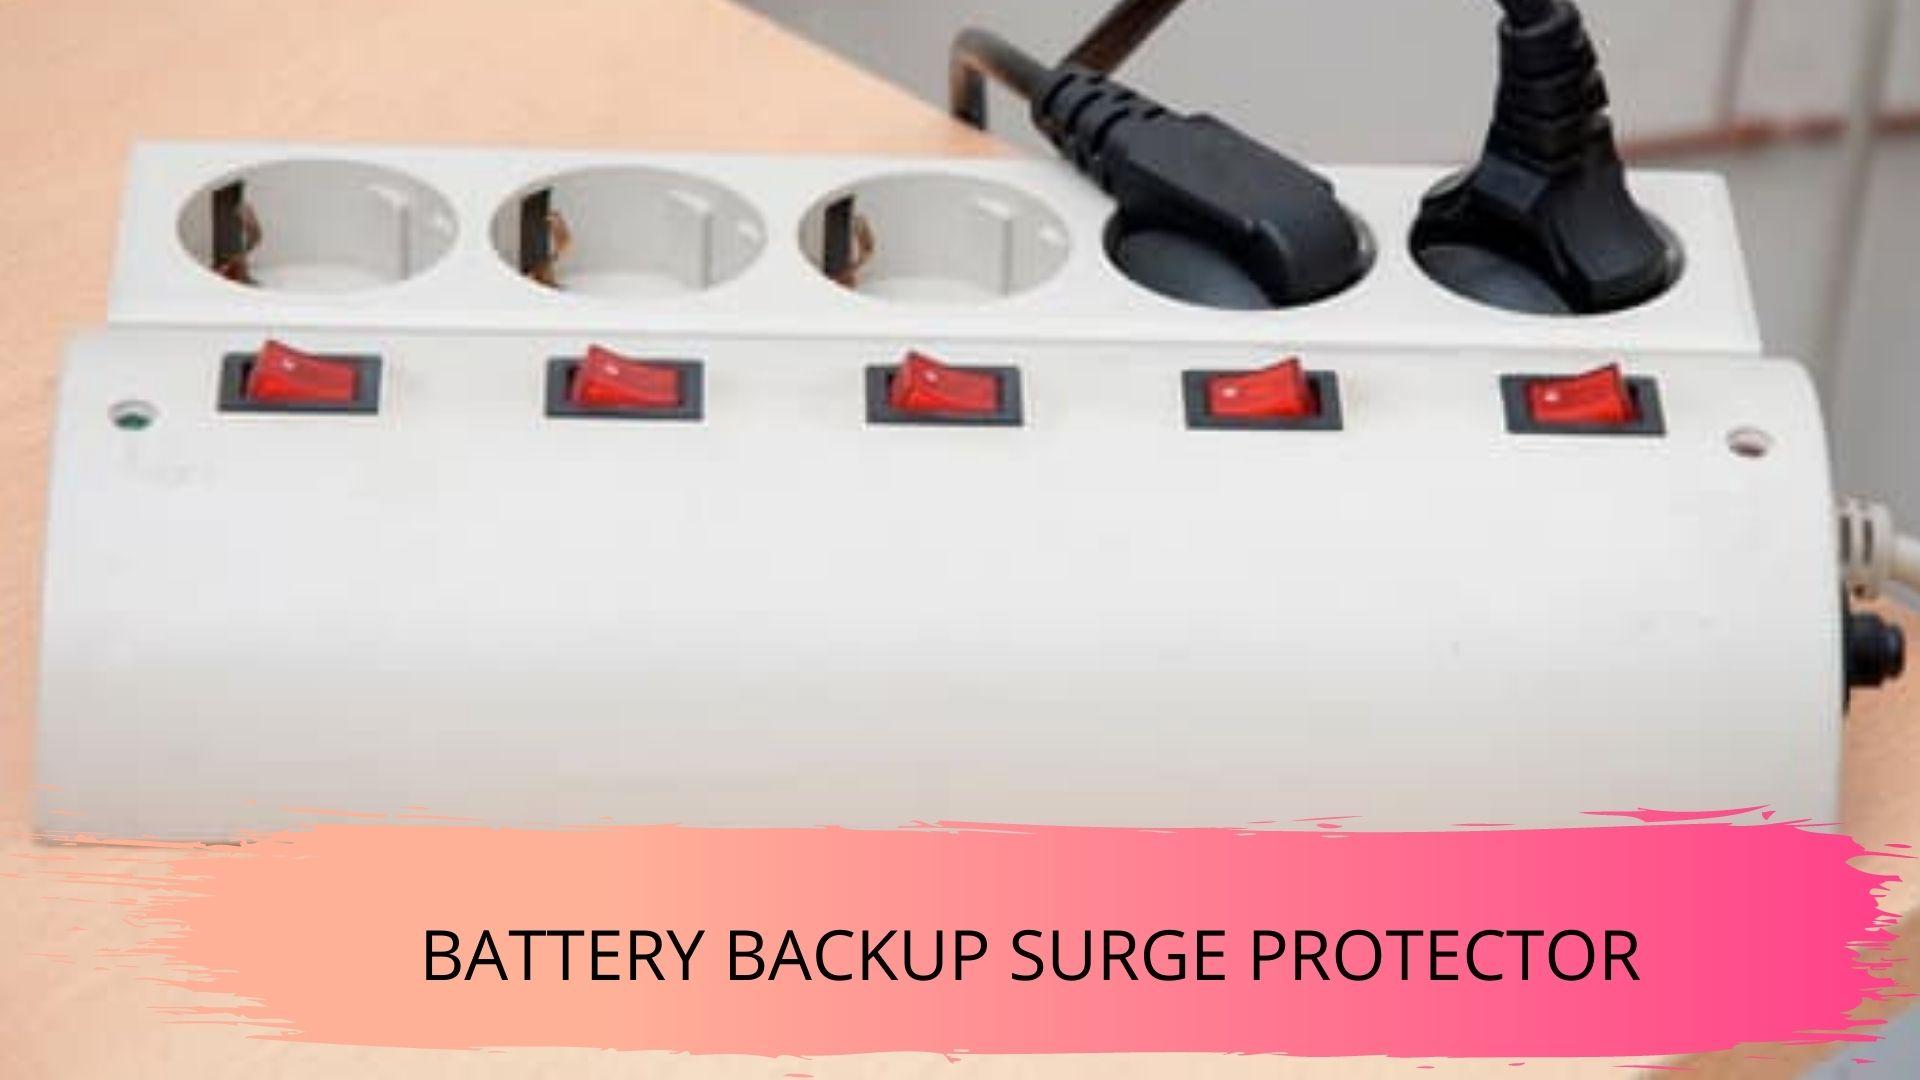 how long do battery backup surge protectors last